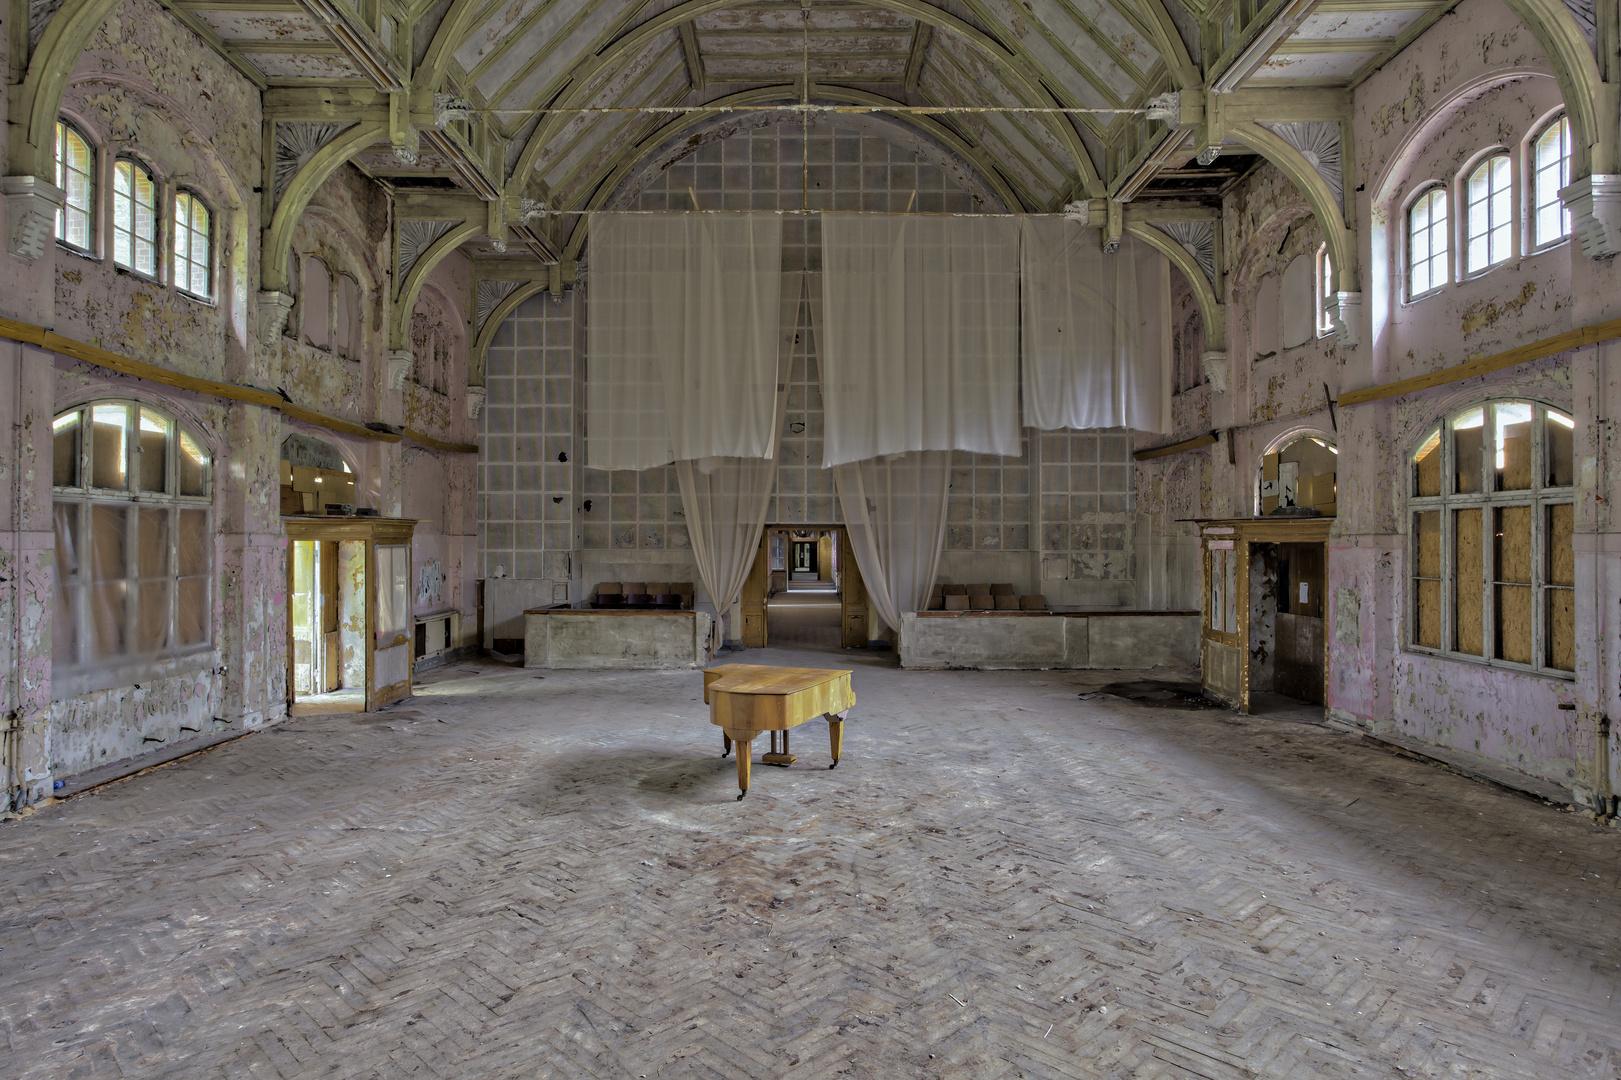 Beelitz Heilstätten - Männerlungenheilstätte Wohnpavillon (1)